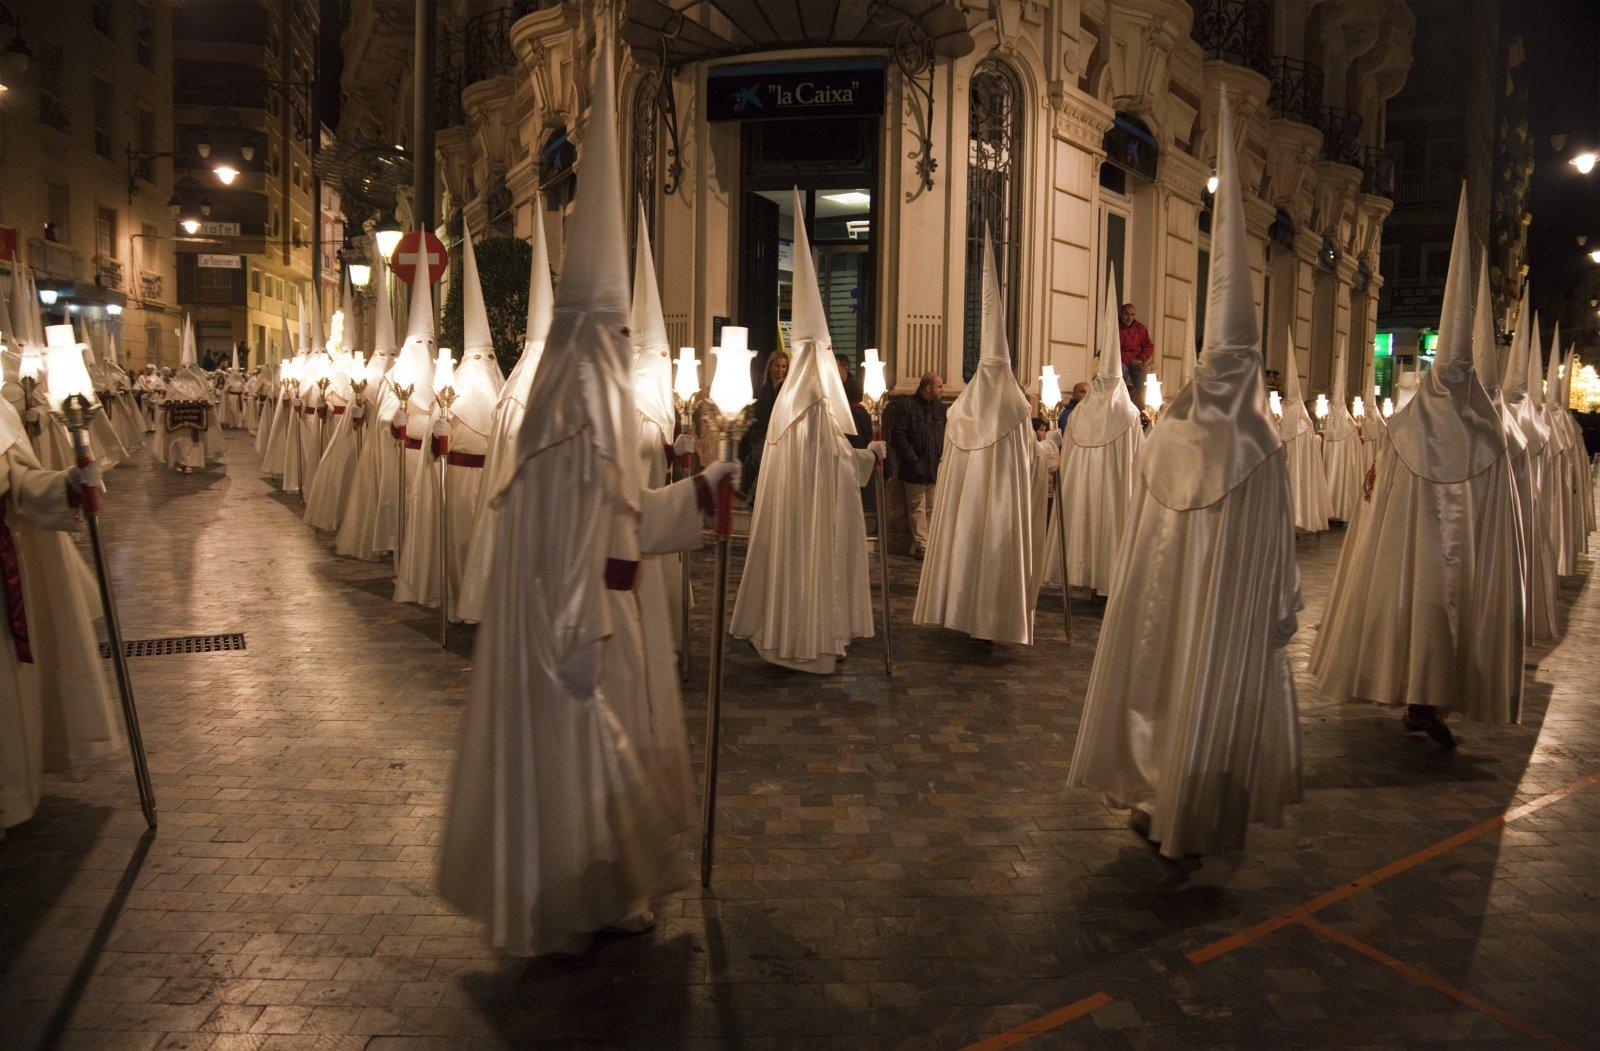 Semana Santa Procession in Cartagena, Spain